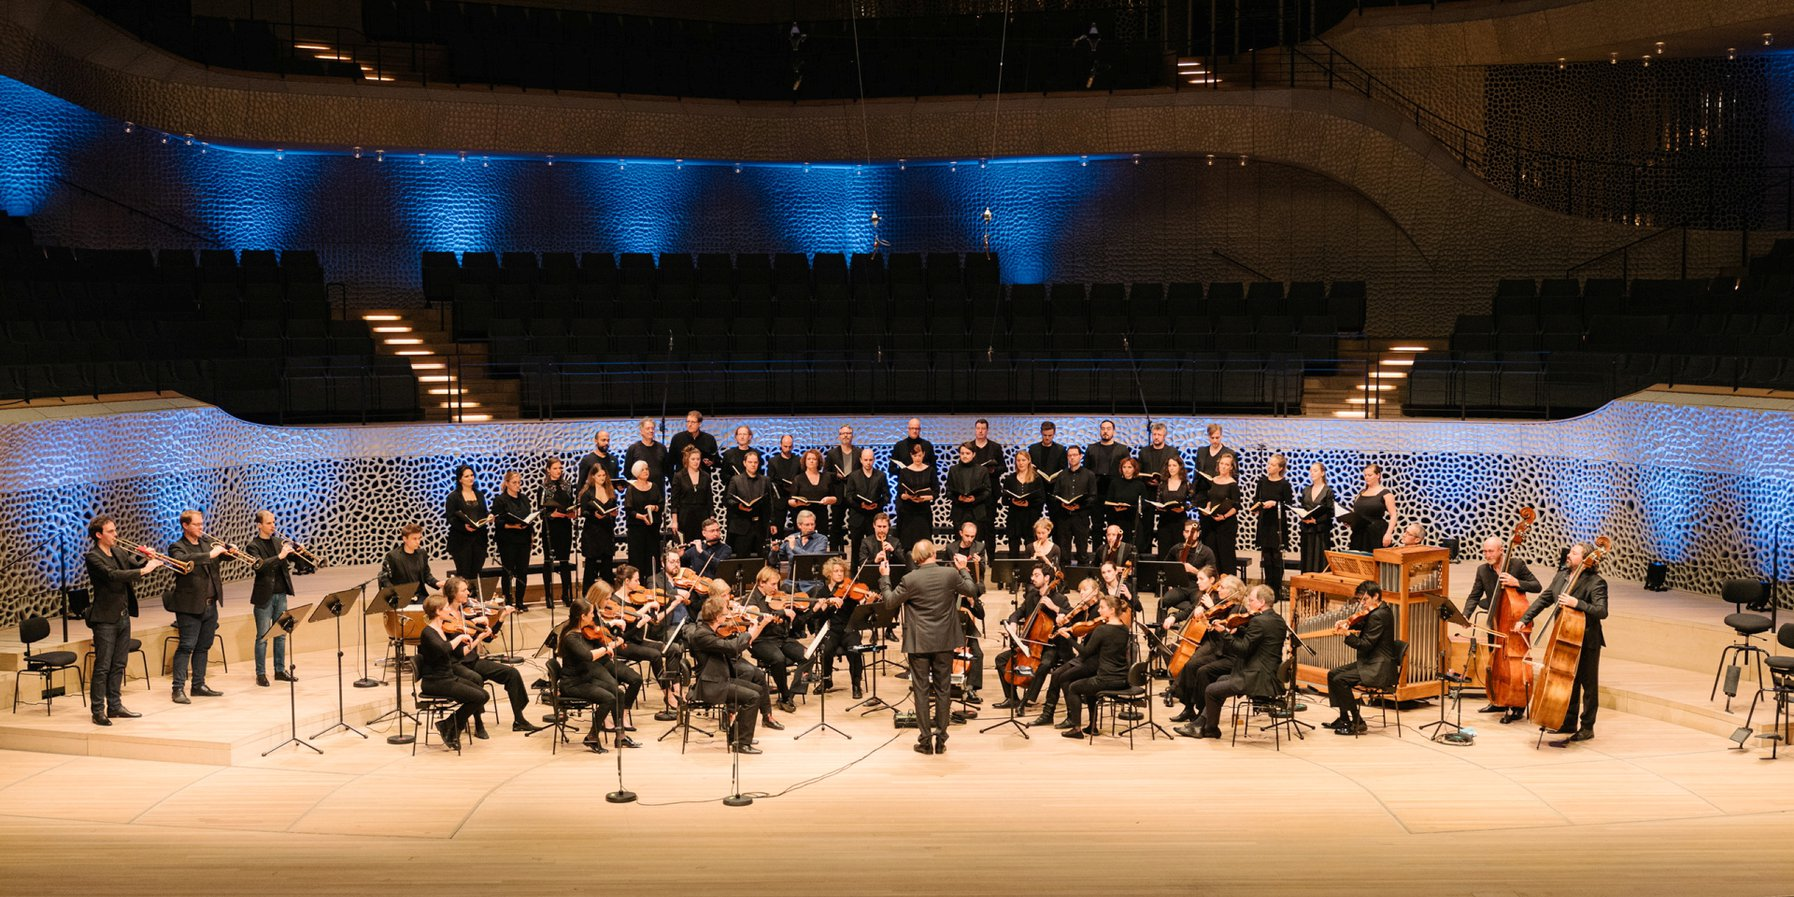 Balthasar-Neumann-Ensemble und -Chor / Thomas Hengelbrock